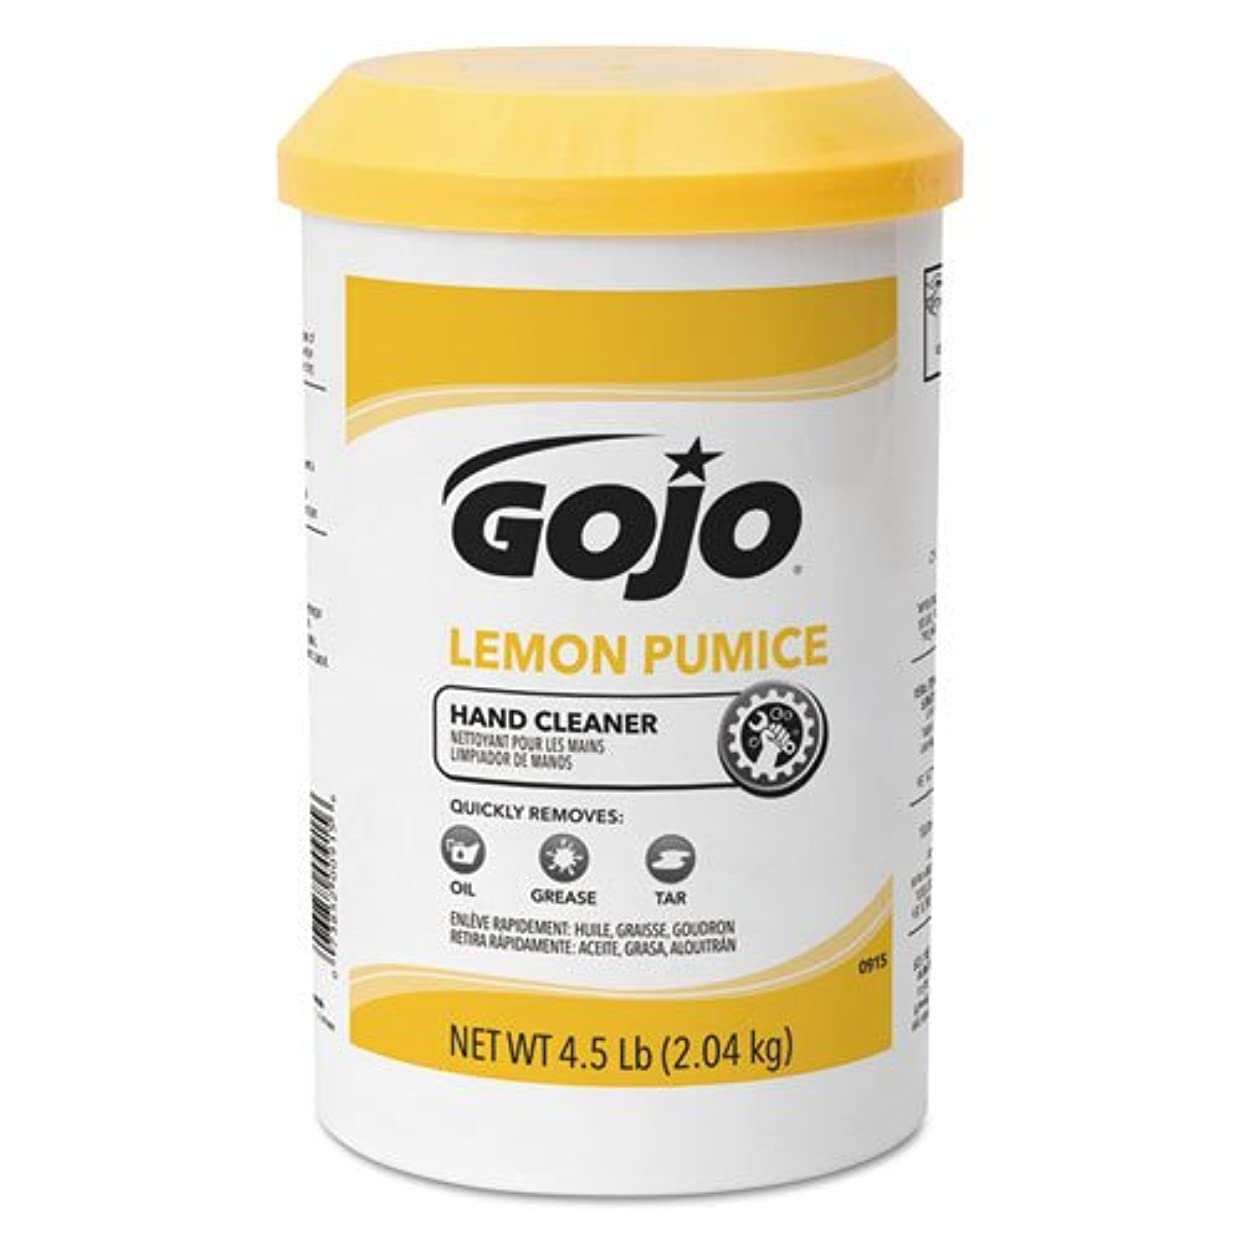 Gojo レモンプーミス ハンドクリーナー レモンの香り 4.5ポンド GOJ0915